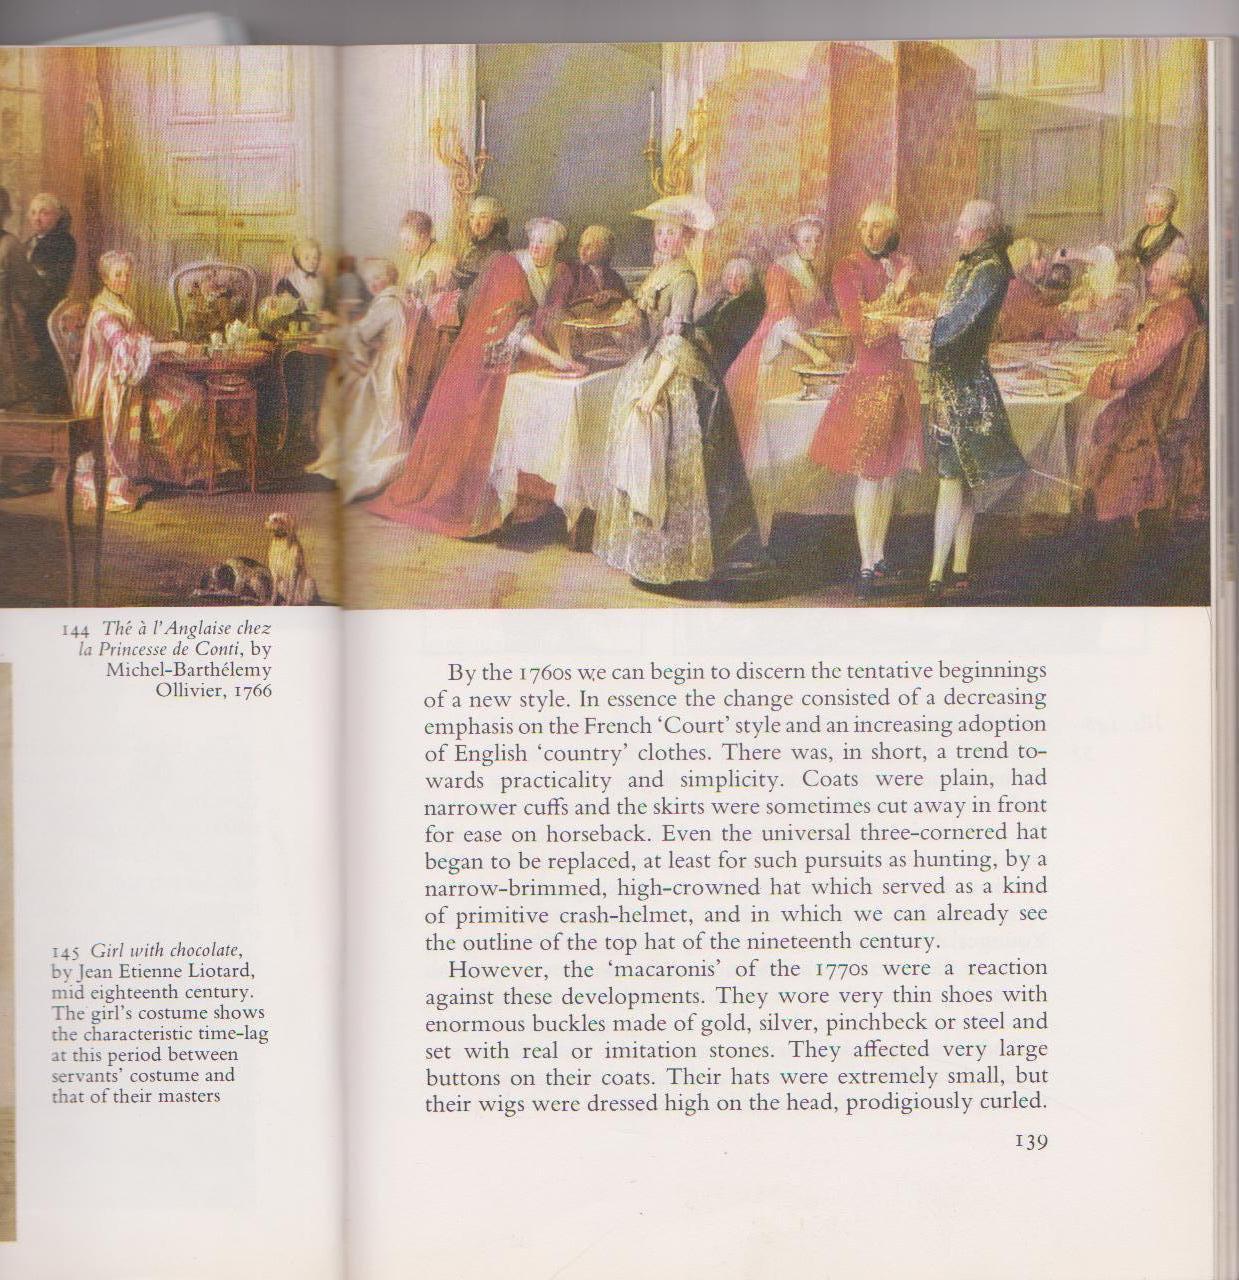 Costume & Fashion - J.Laver - Inner Page2 - HandBound Bibliography